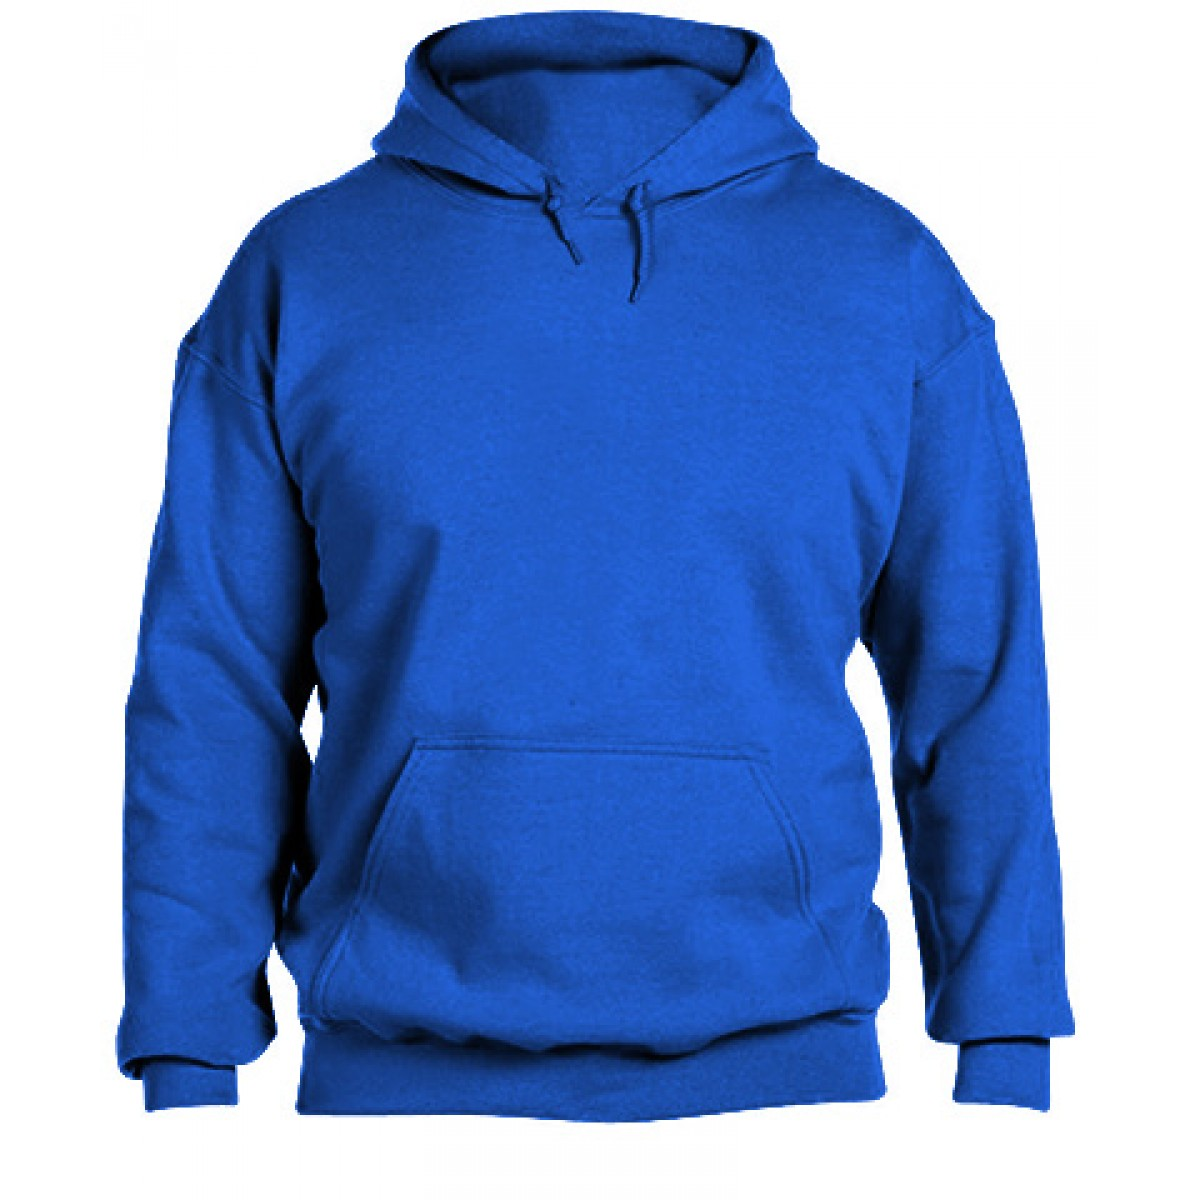 Hooded Sweatshirt 50/50 Heavy Blend-M